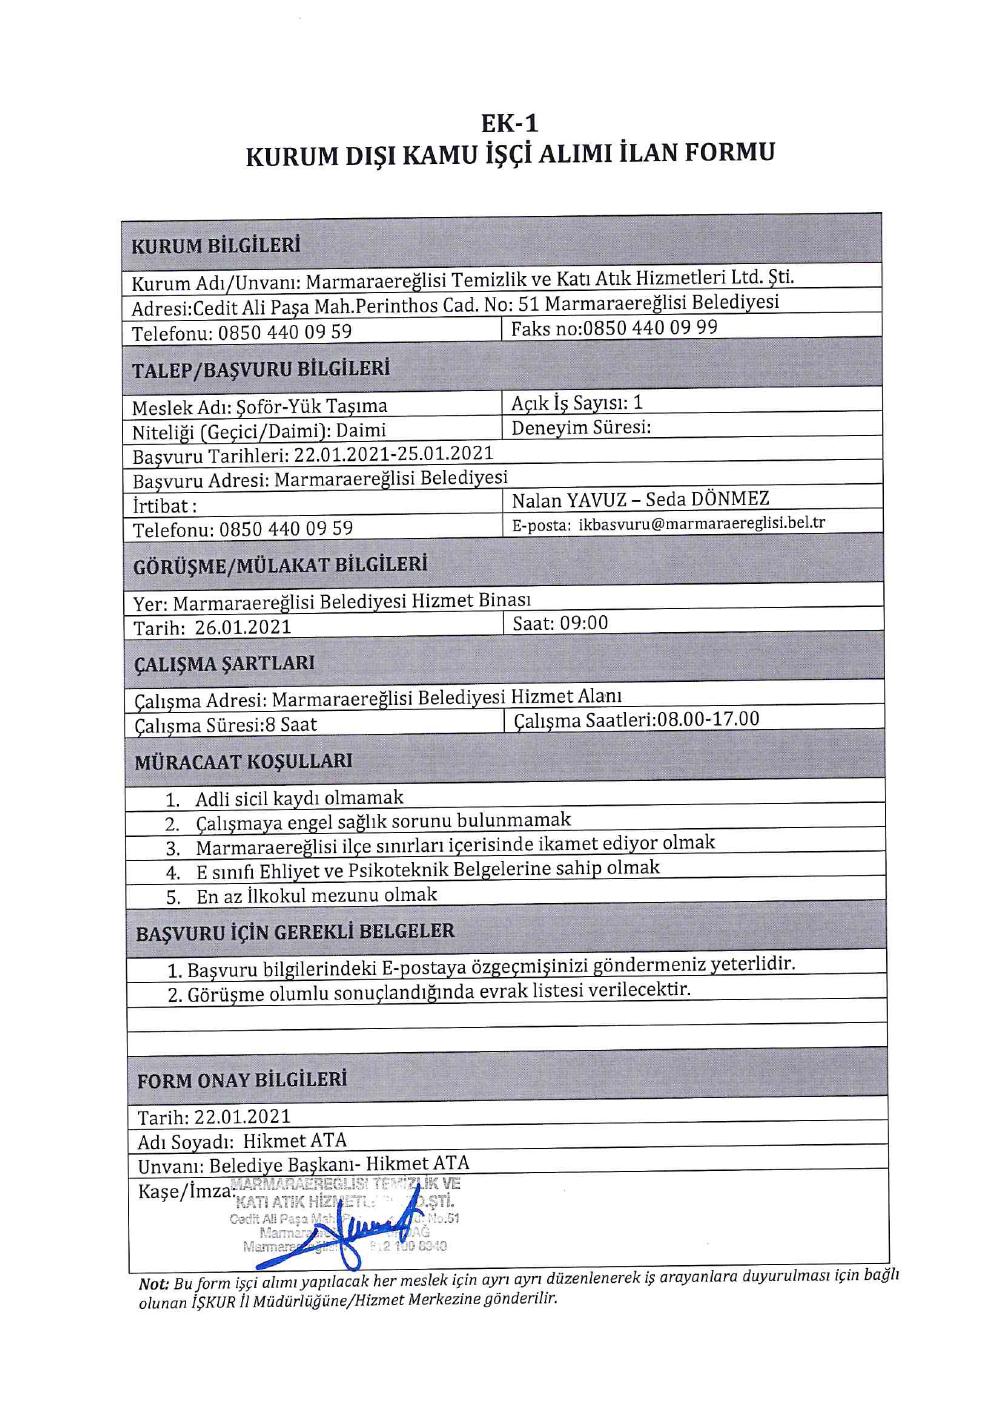 tekirdag-marmaraereglisi-temizlik-ve-kati-atik-hizmetleri-ltd-sti-25-01-2021-000002.png